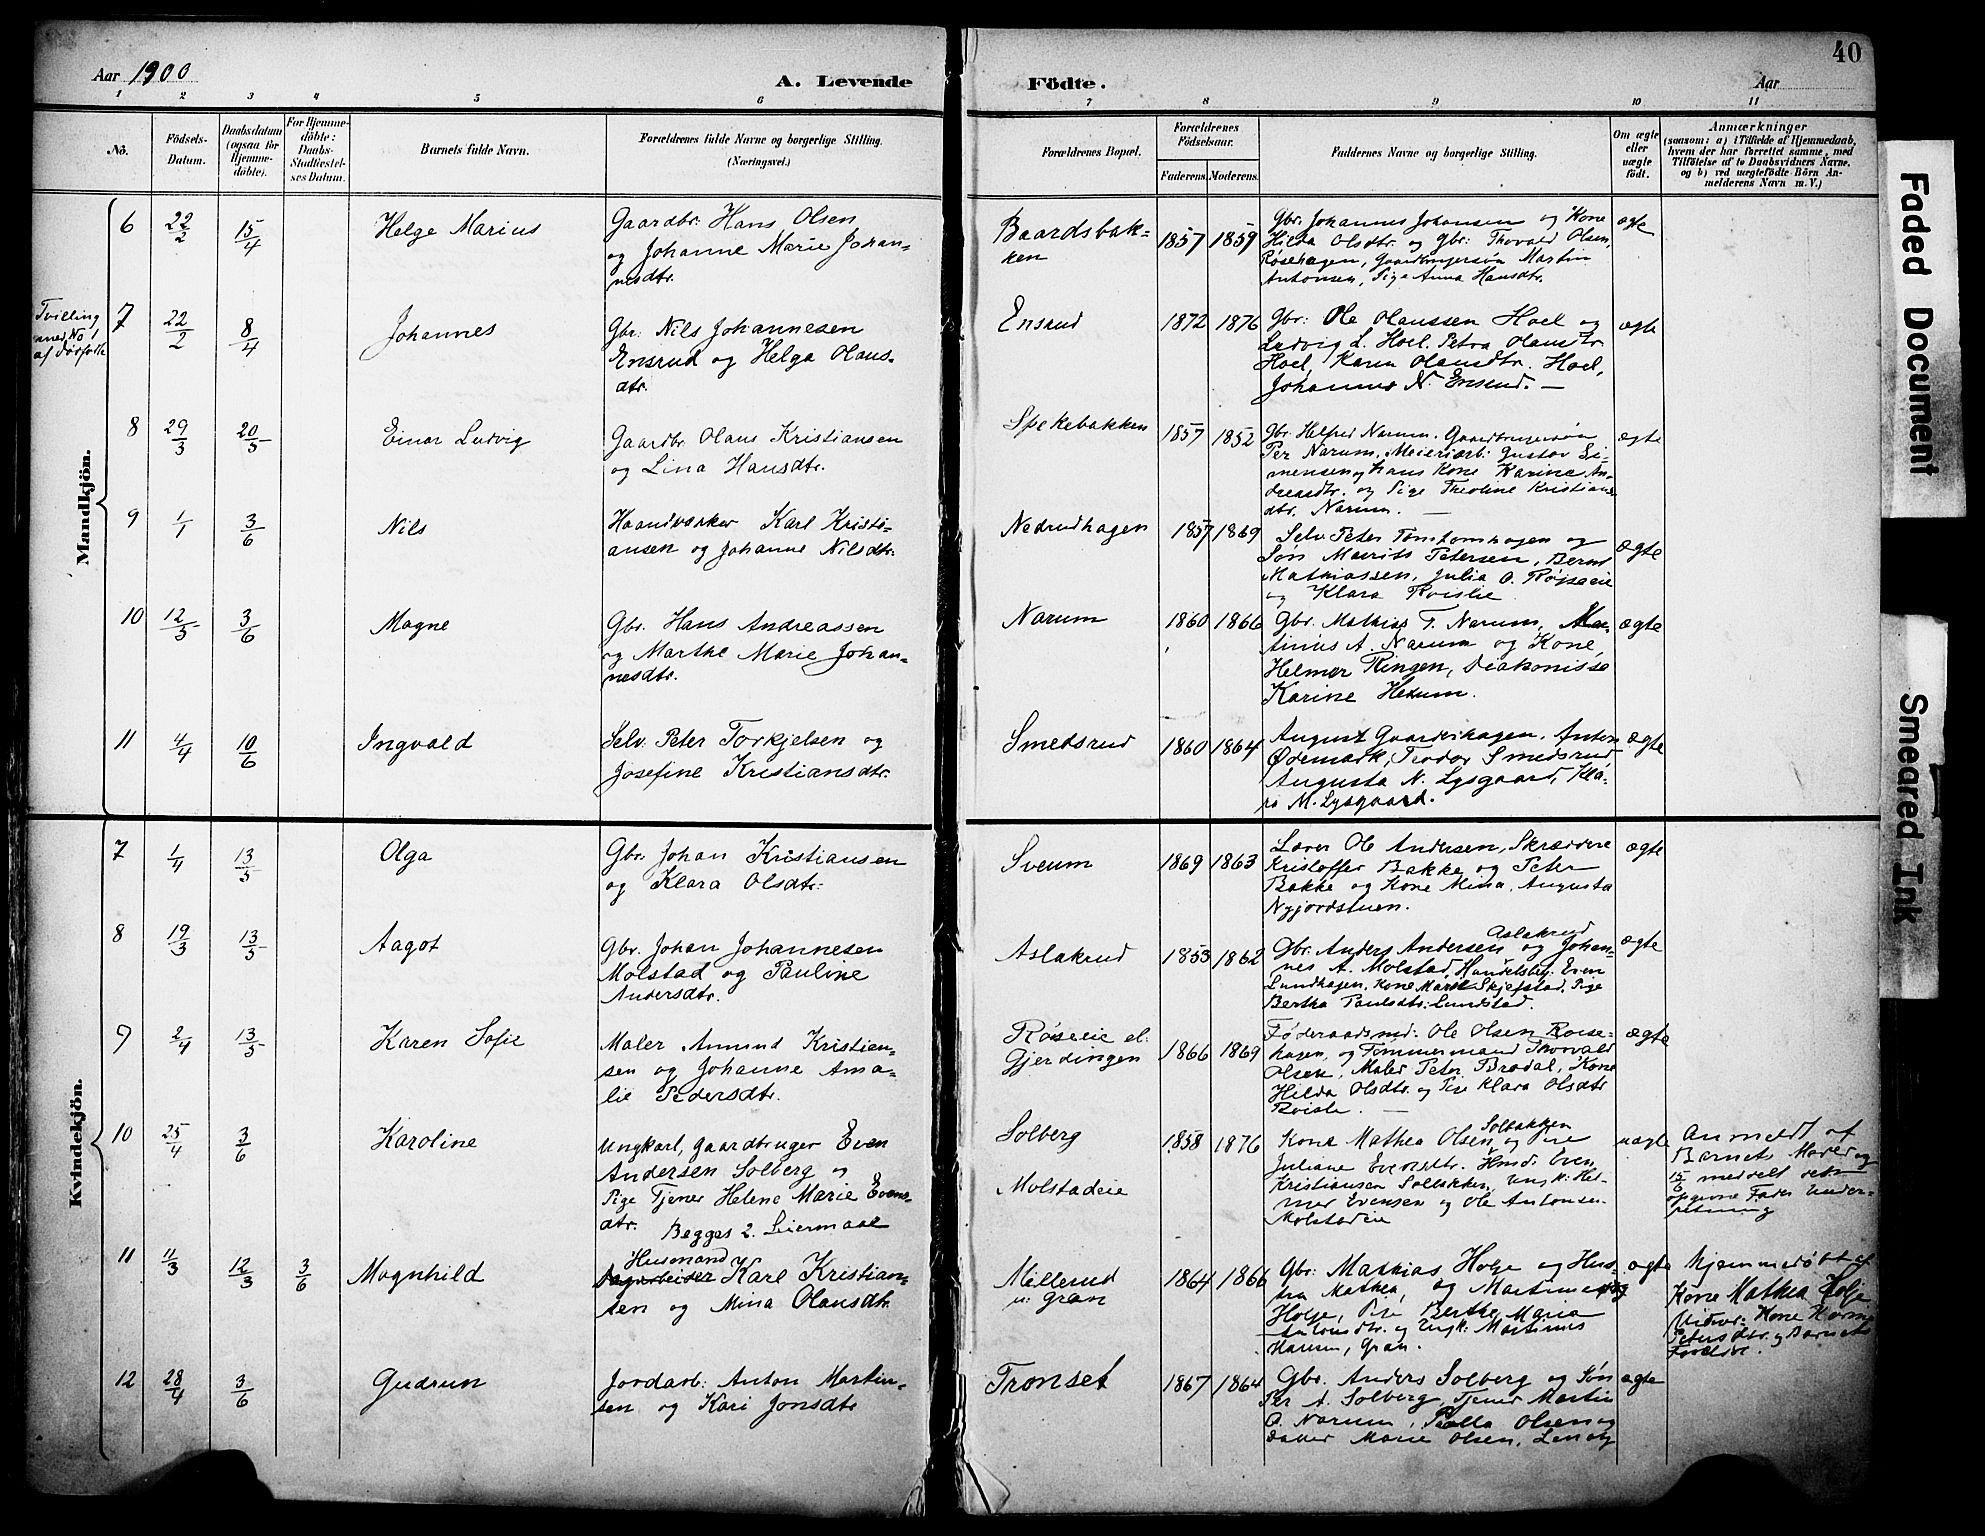 SAH, Vestre Toten prestekontor, H/Ha/Haa/L0013: Ministerialbok nr. 13, 1895-1911, s. 40